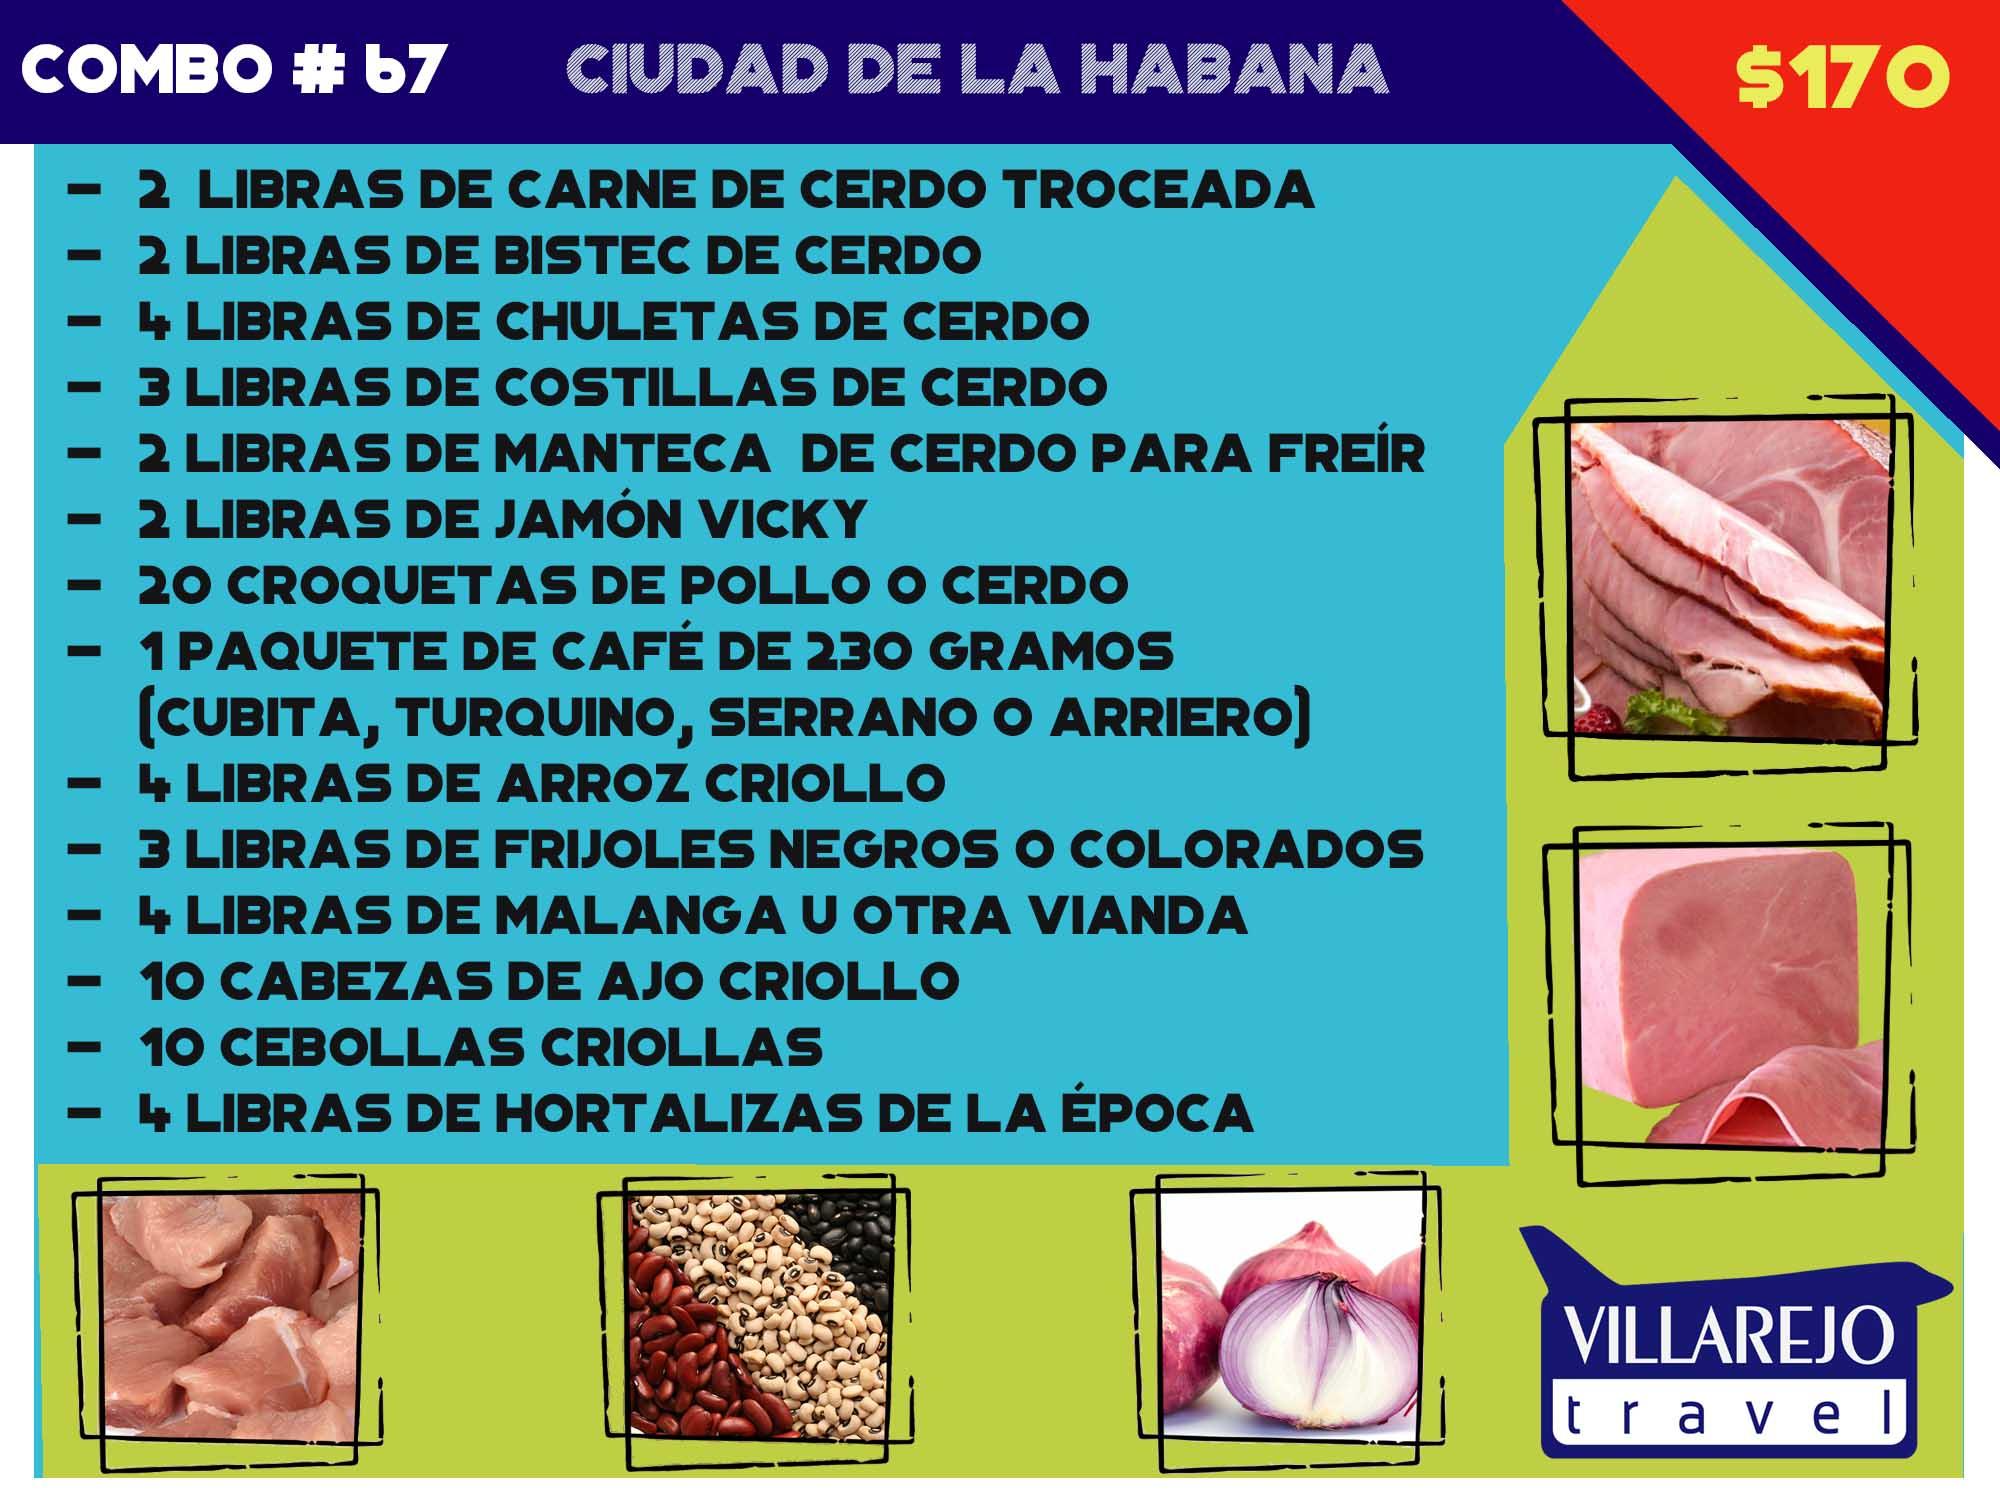 COMBO # 67 CIUDAD DE LA HABANA